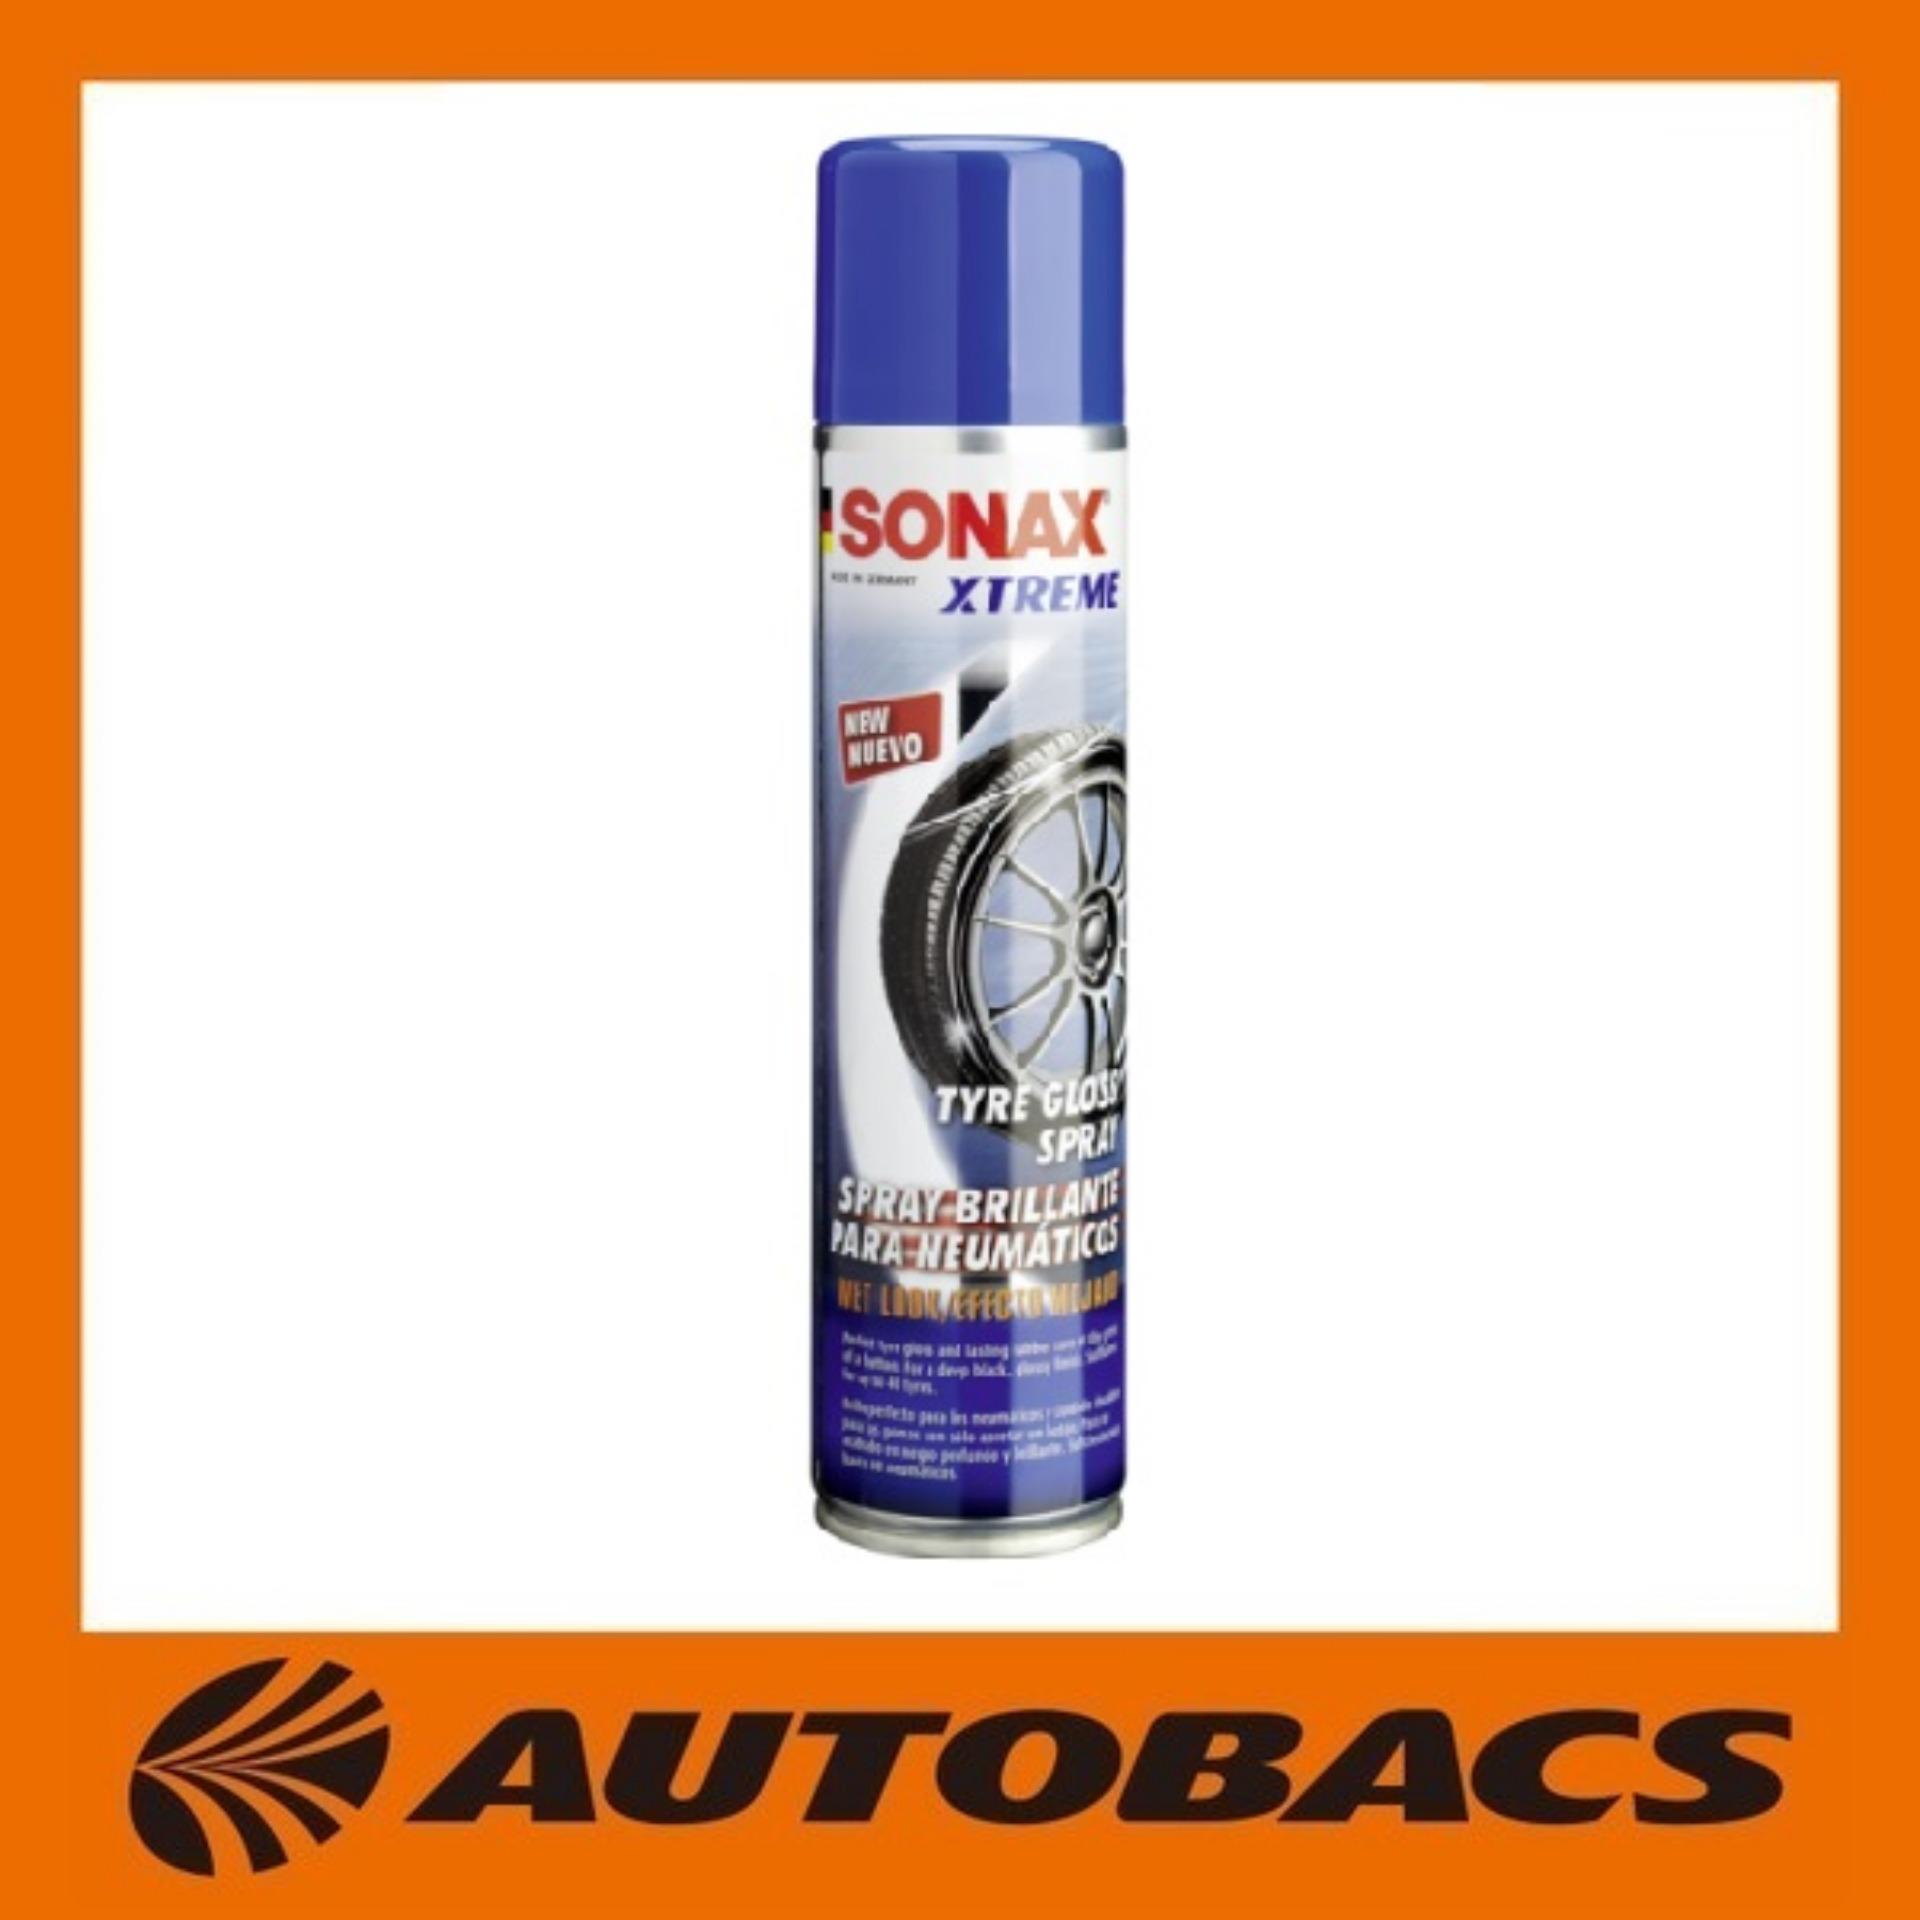 Sonax Xtreme Tyre Gloss Spray Sale